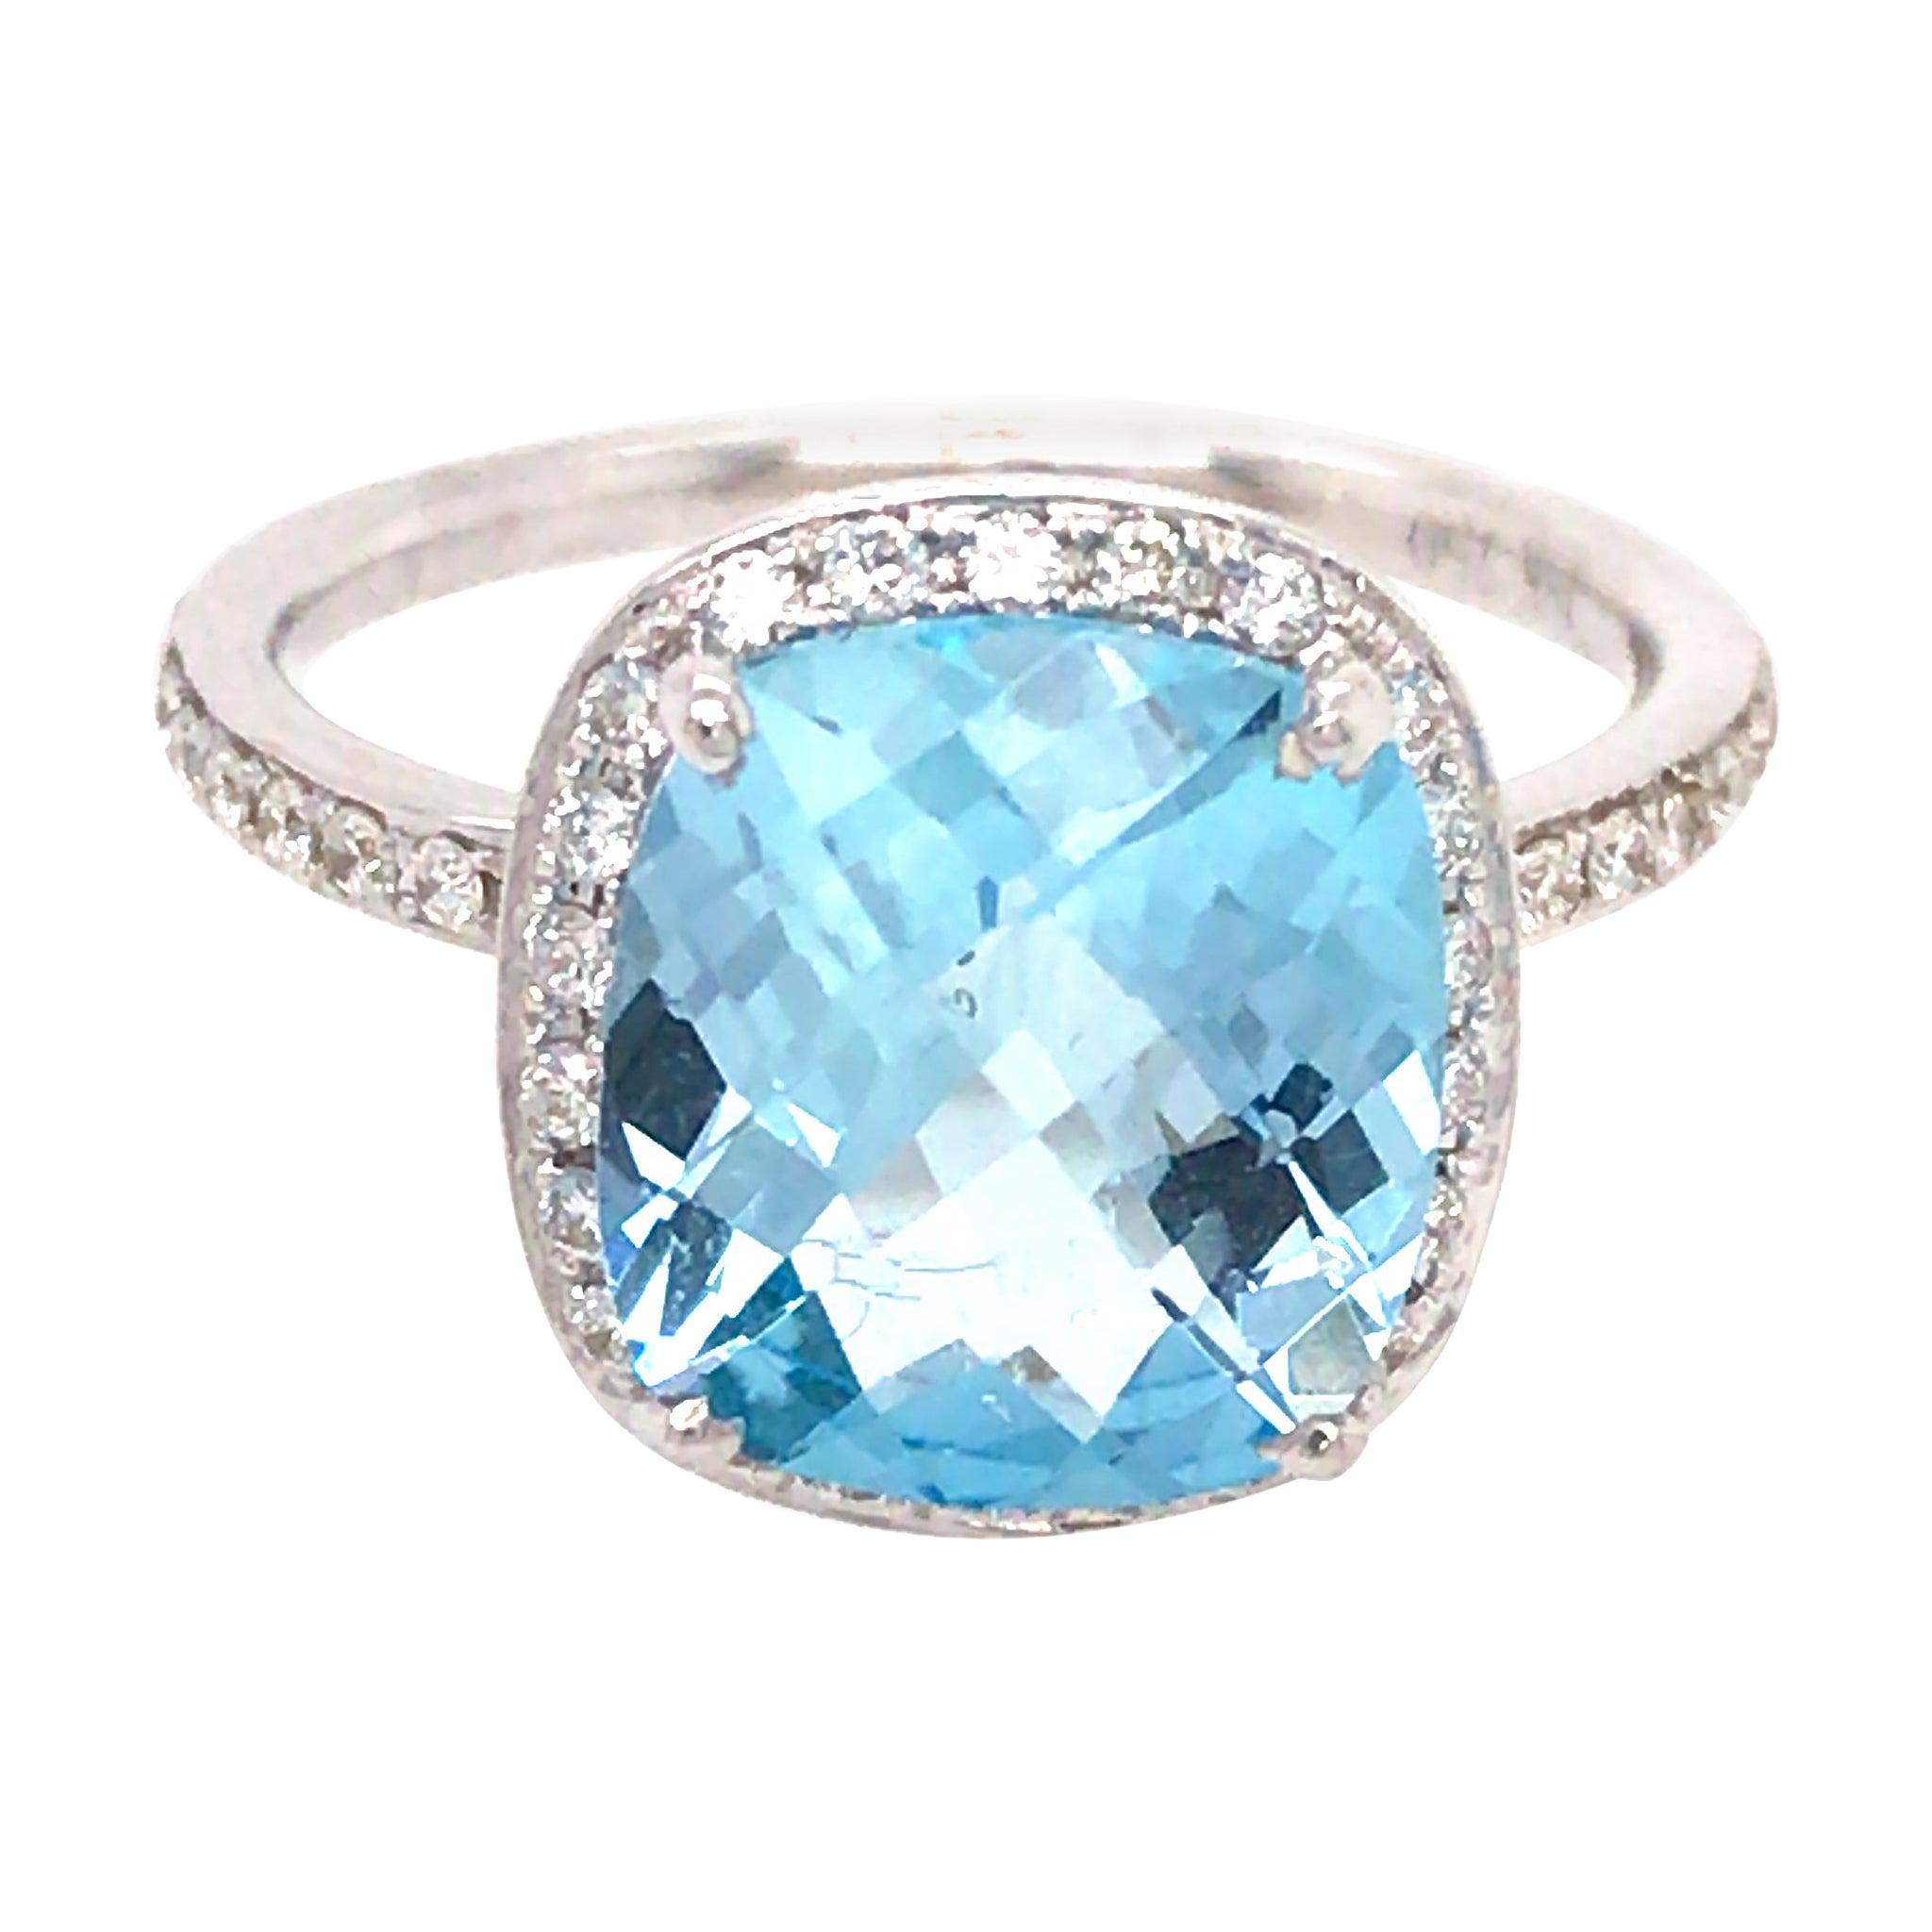 18k White Gold Topaz and Diamond Ring